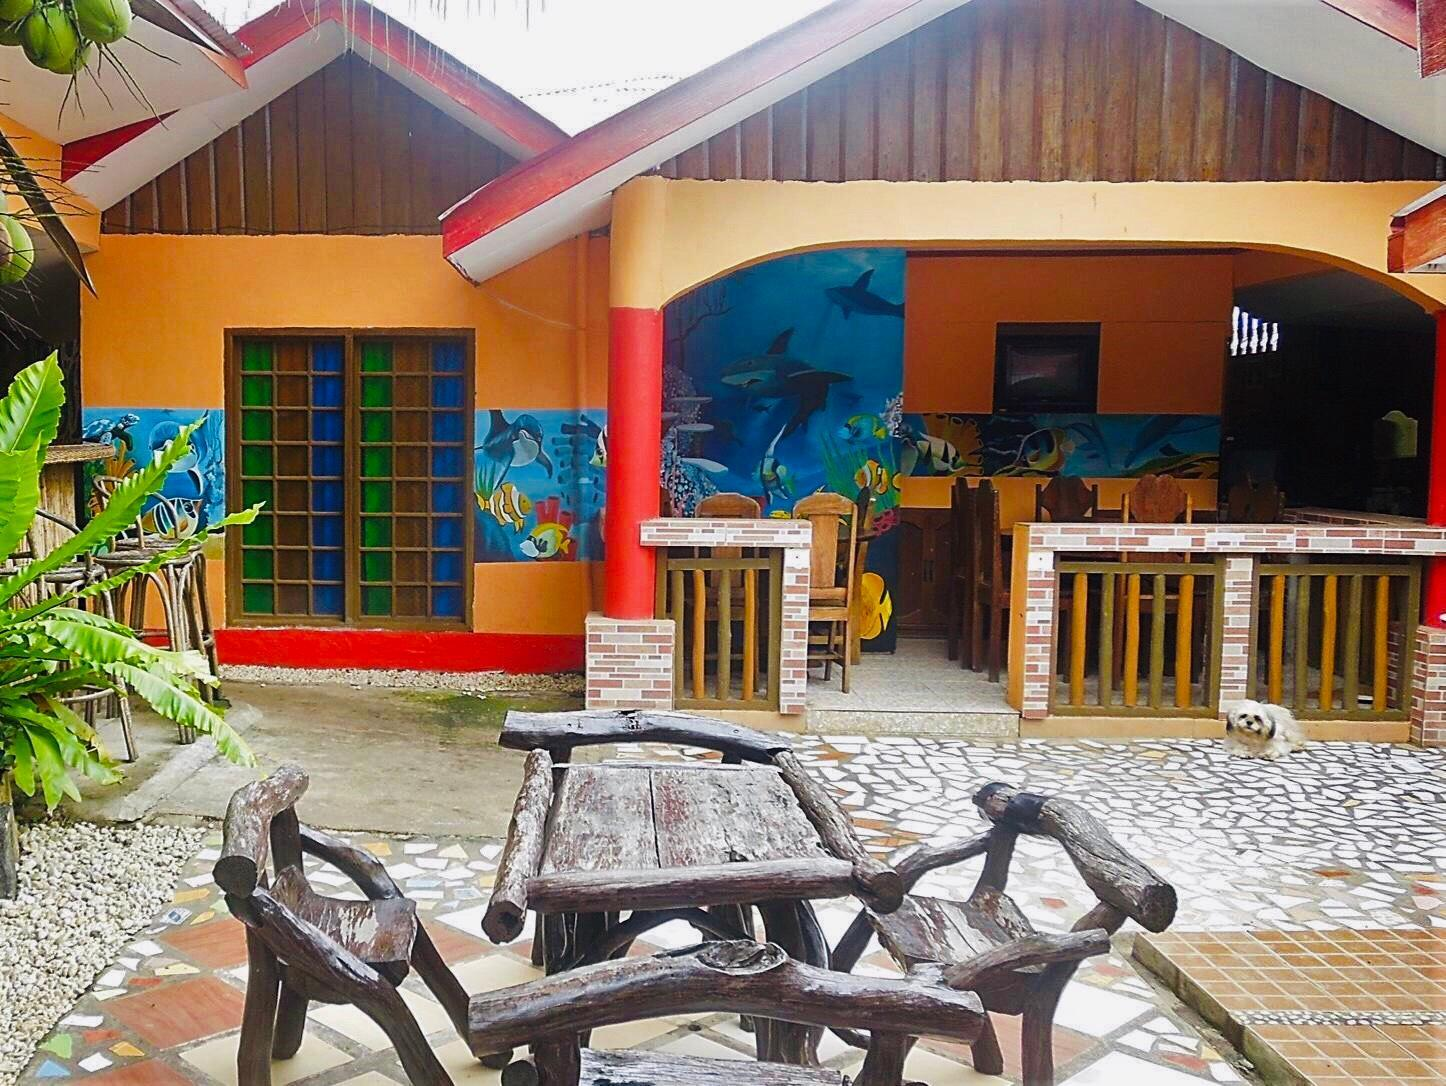 Gracia's Budget Inn